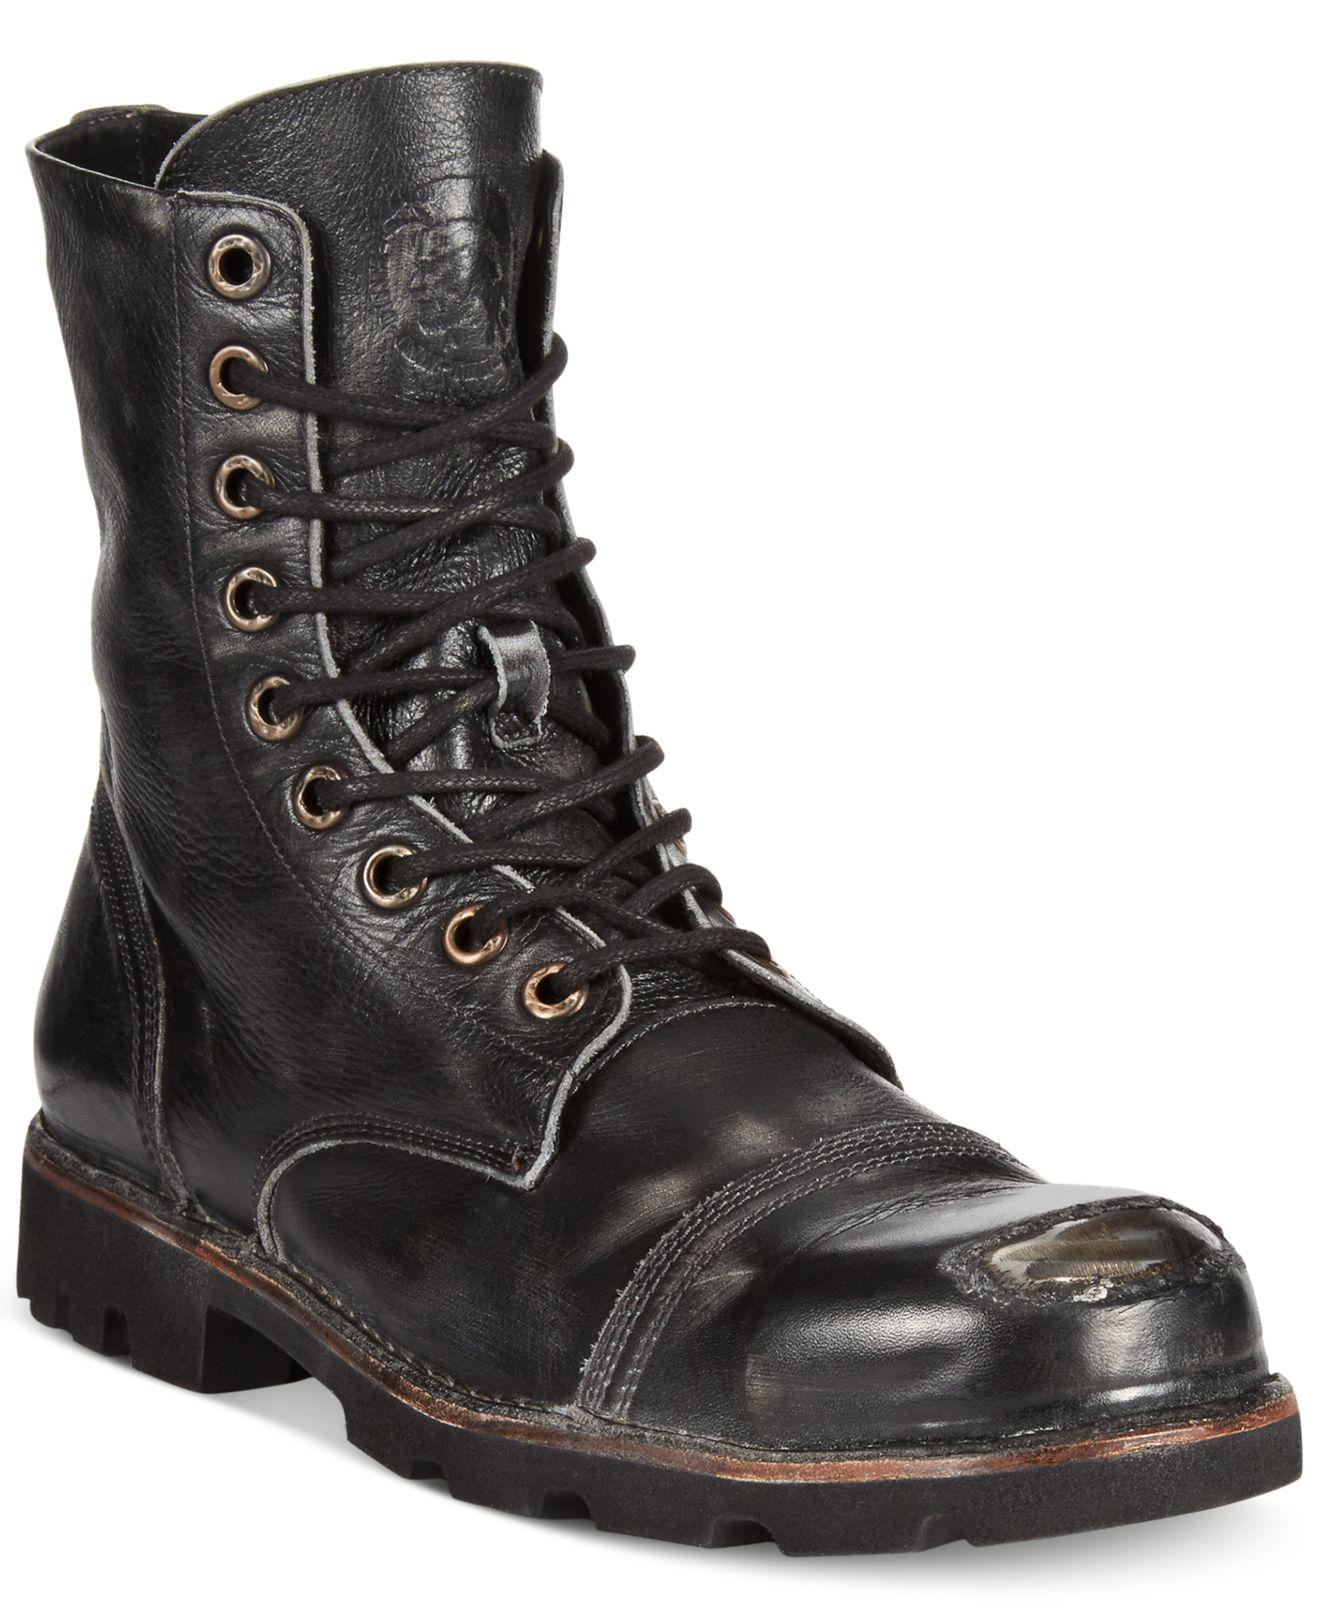 Lyst - Diesel Hardkor Steel Toe Boots in Black for Men